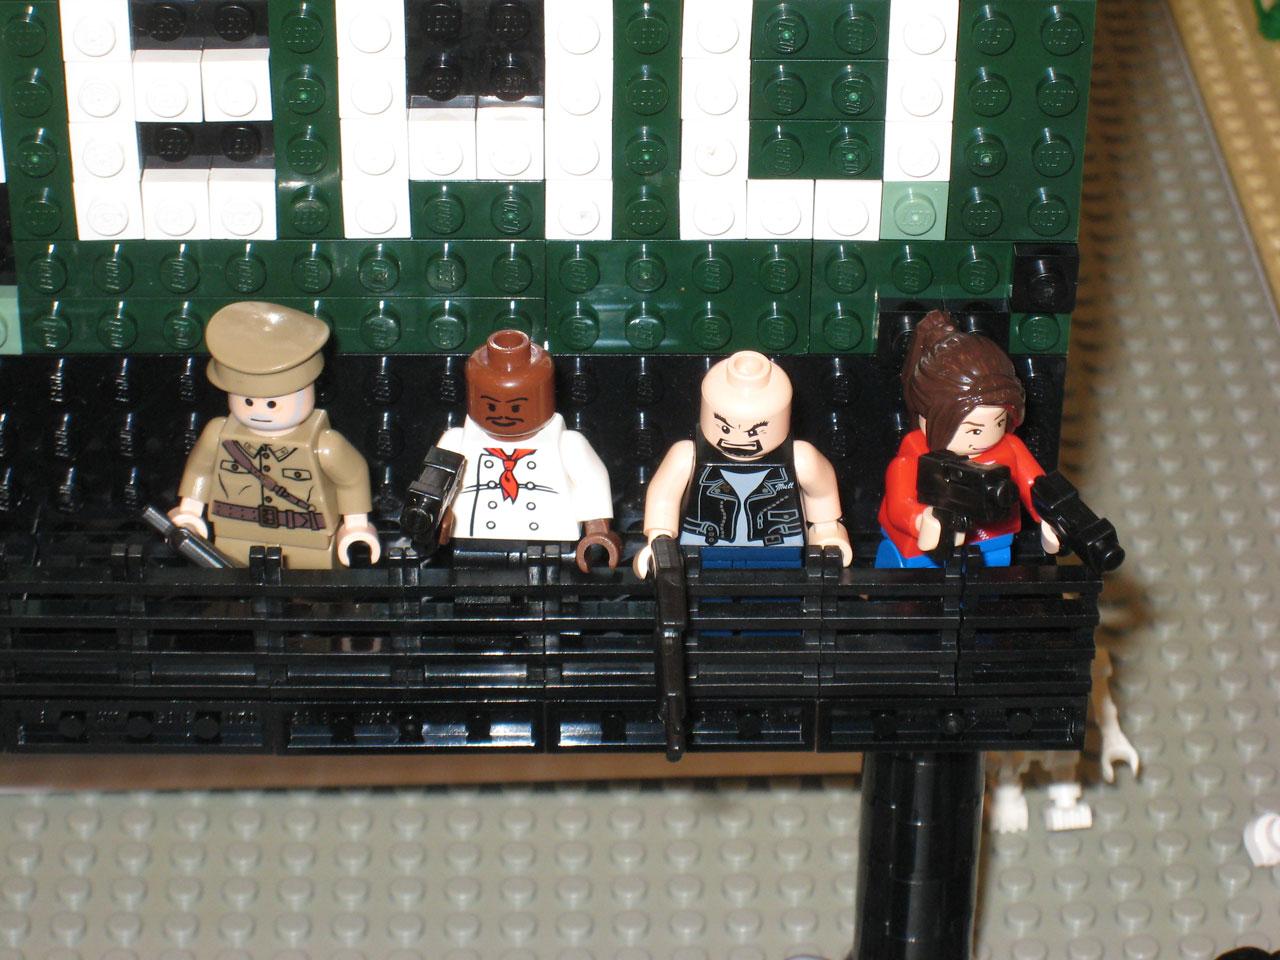 https://www.l4d.com/blog/images/posts/002/Lego02.jpg